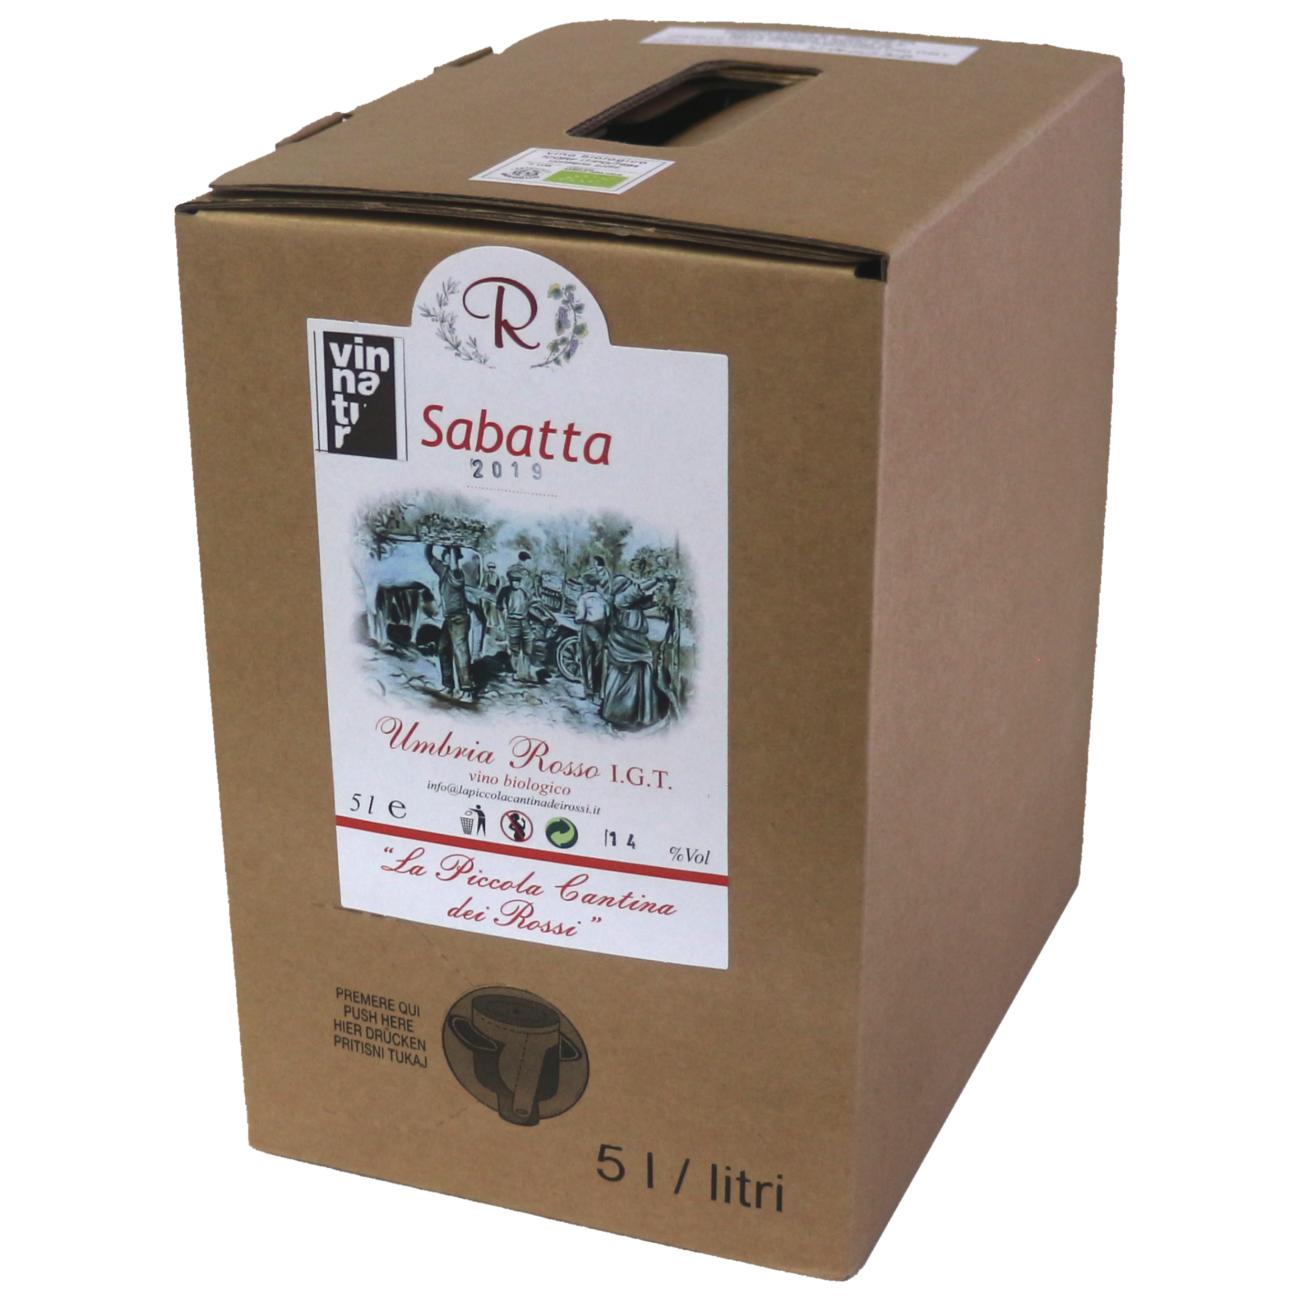 Sabatta 2019 da uve di Cabernet Sauvignon, Merlot, Sangiovese e Montepulciano d'Abruzzo Rosso Umbria IGT